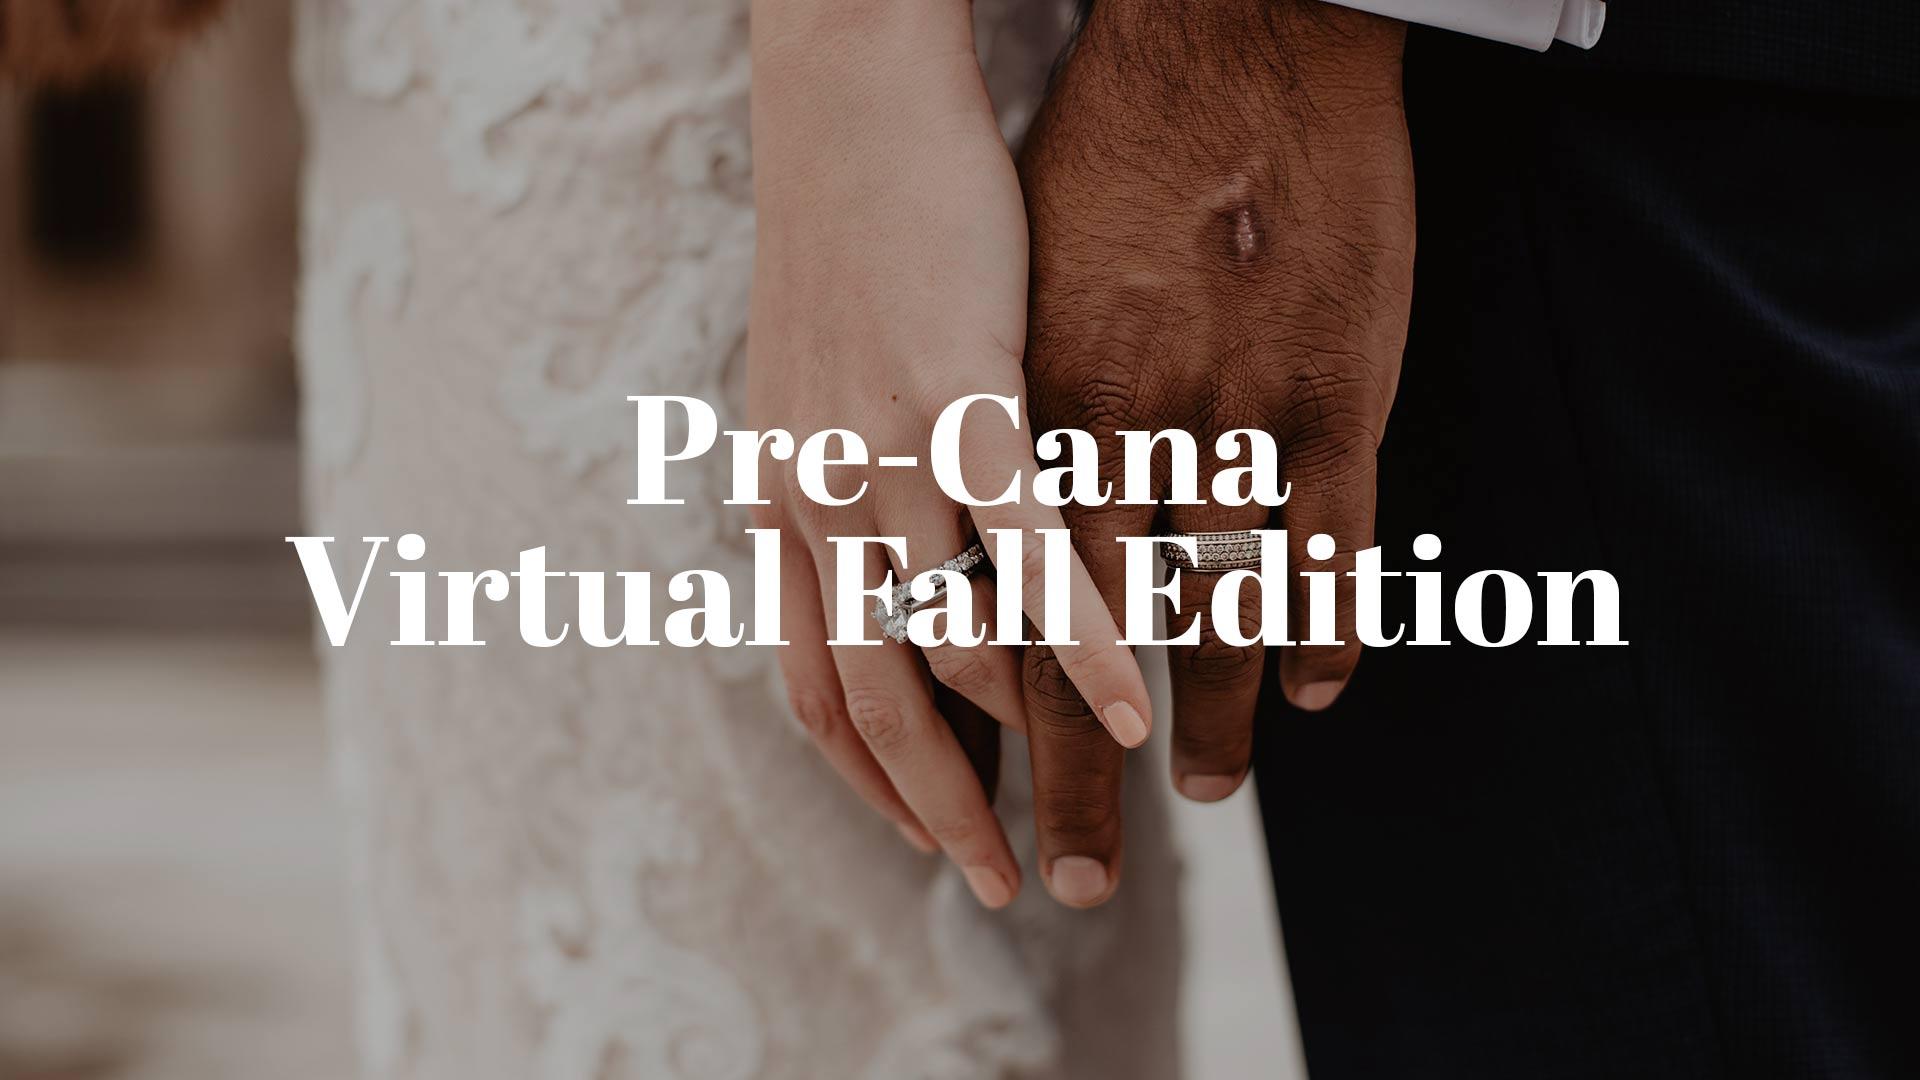 Pre-Cana Virtual Fall Edition